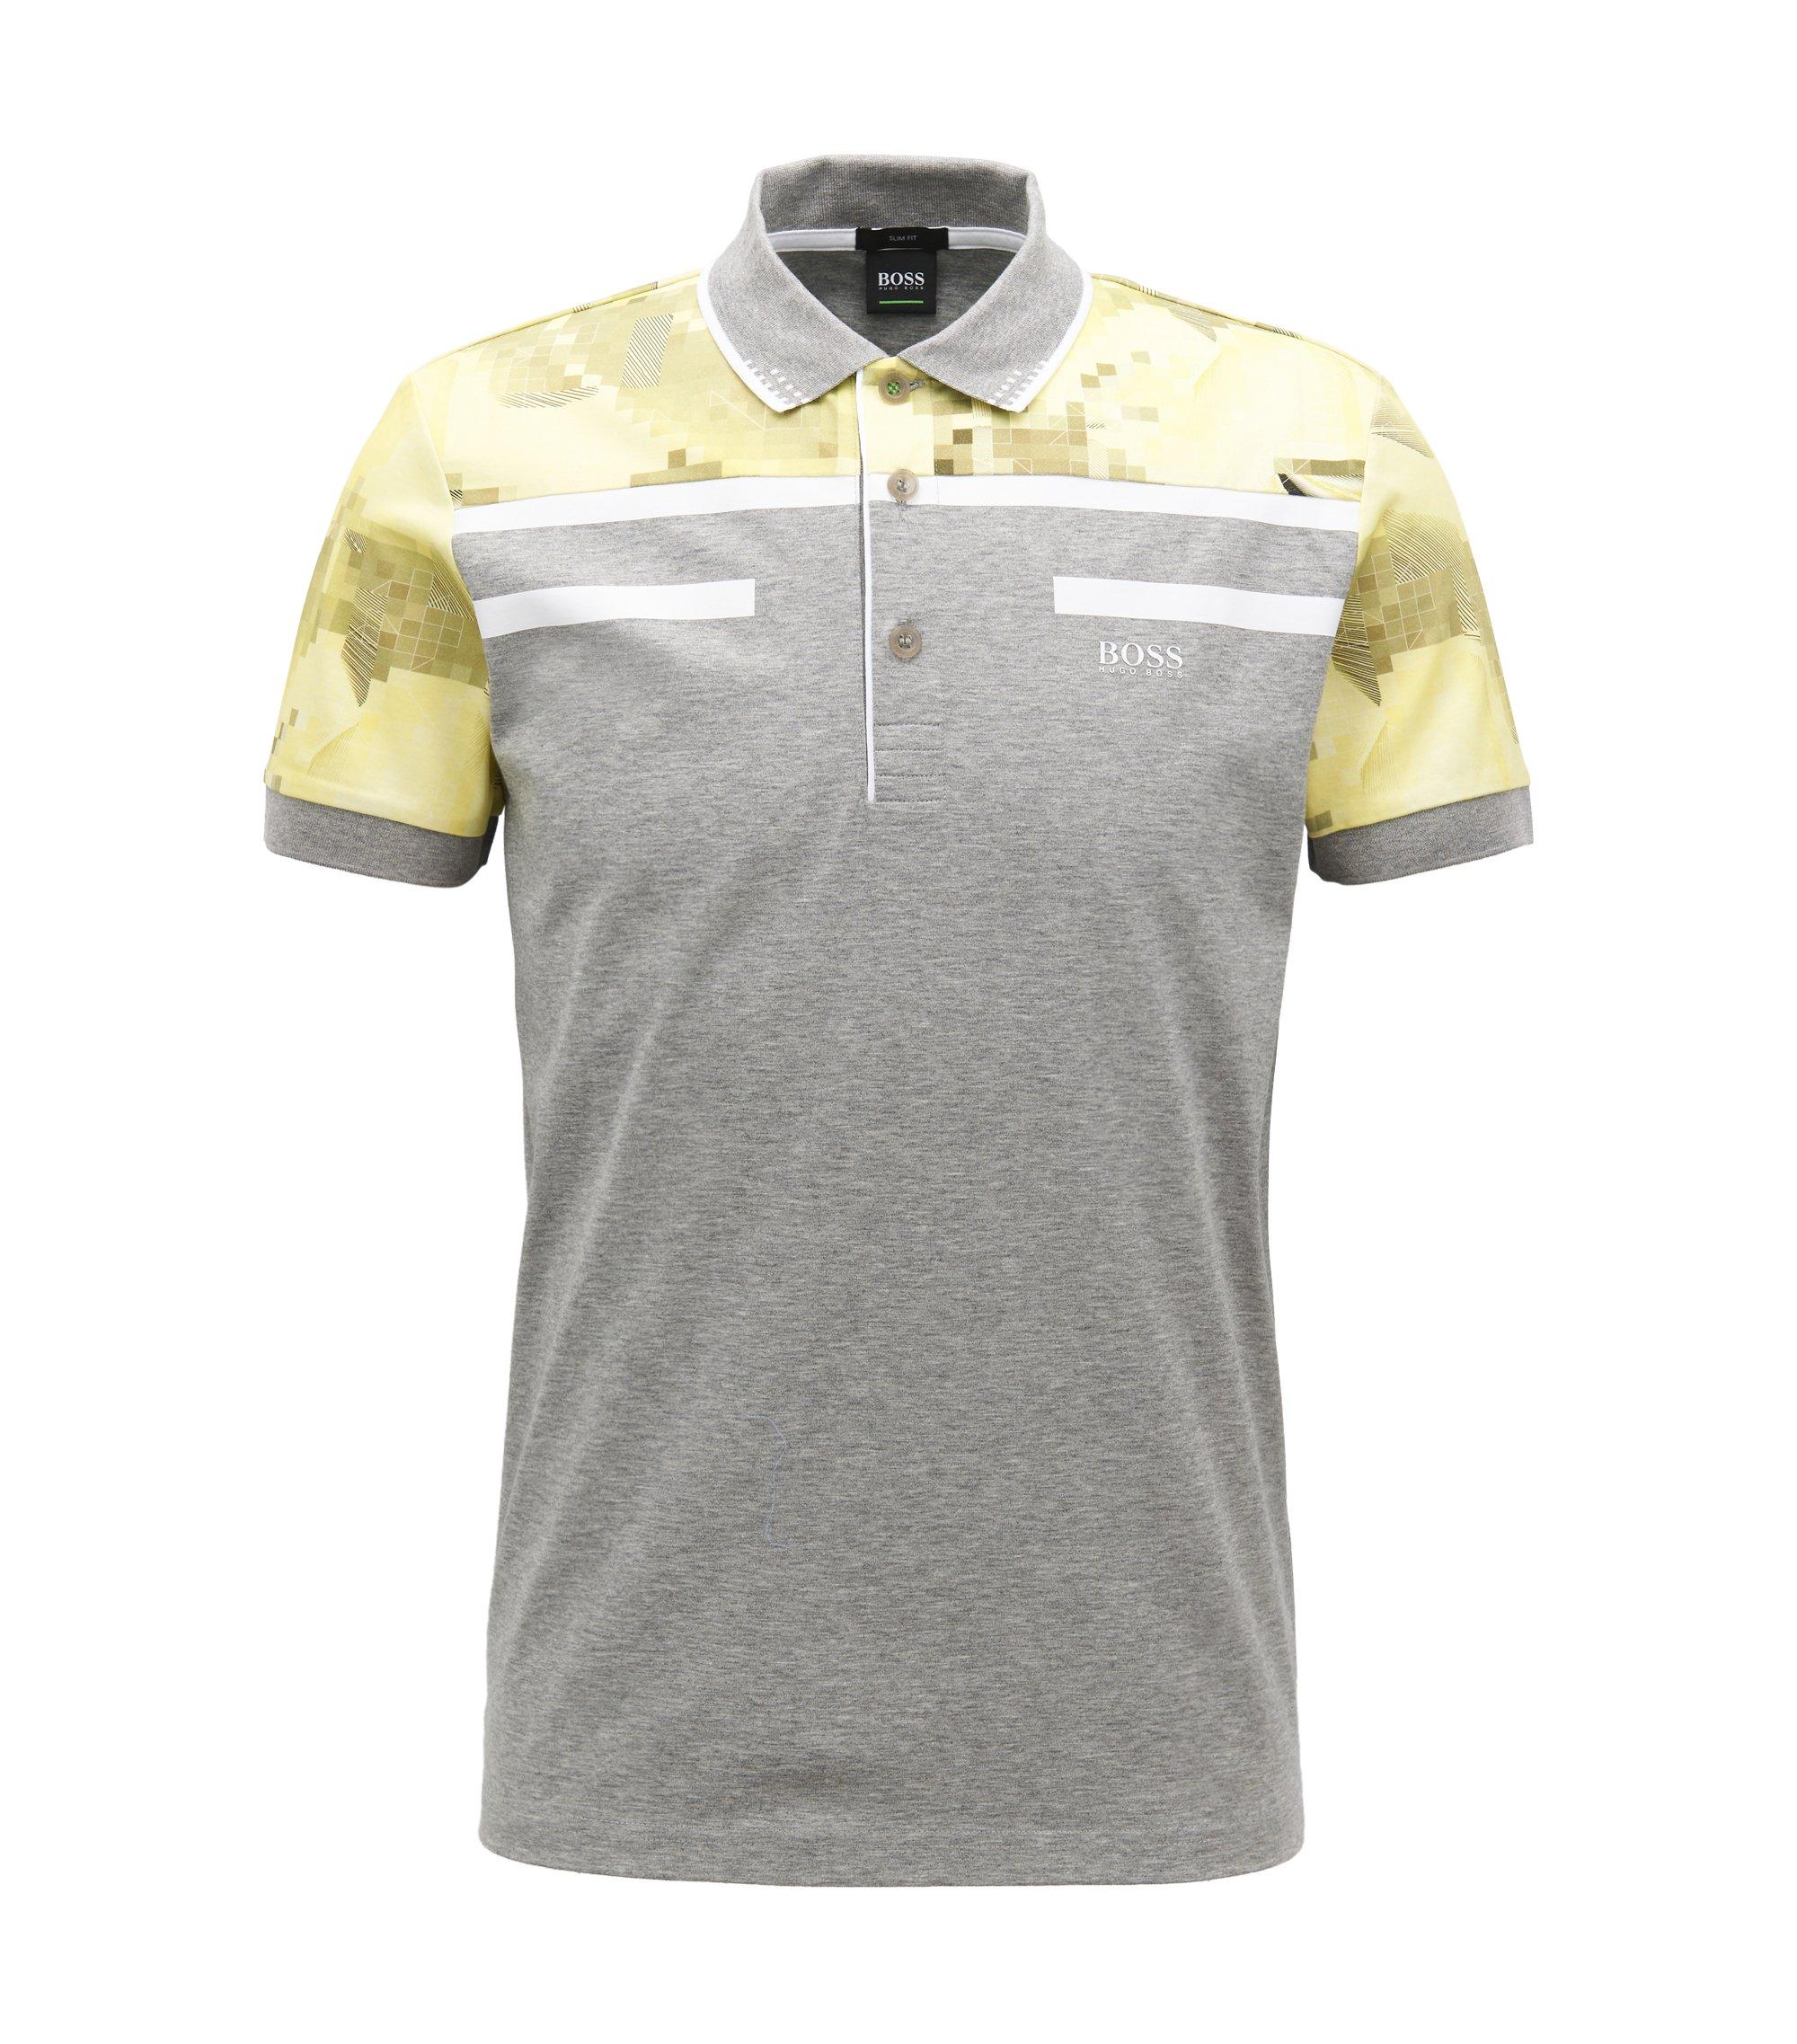 Geometric Mercerized Cotton Polo Shirt, Slim Fit | Paule, Light Grey